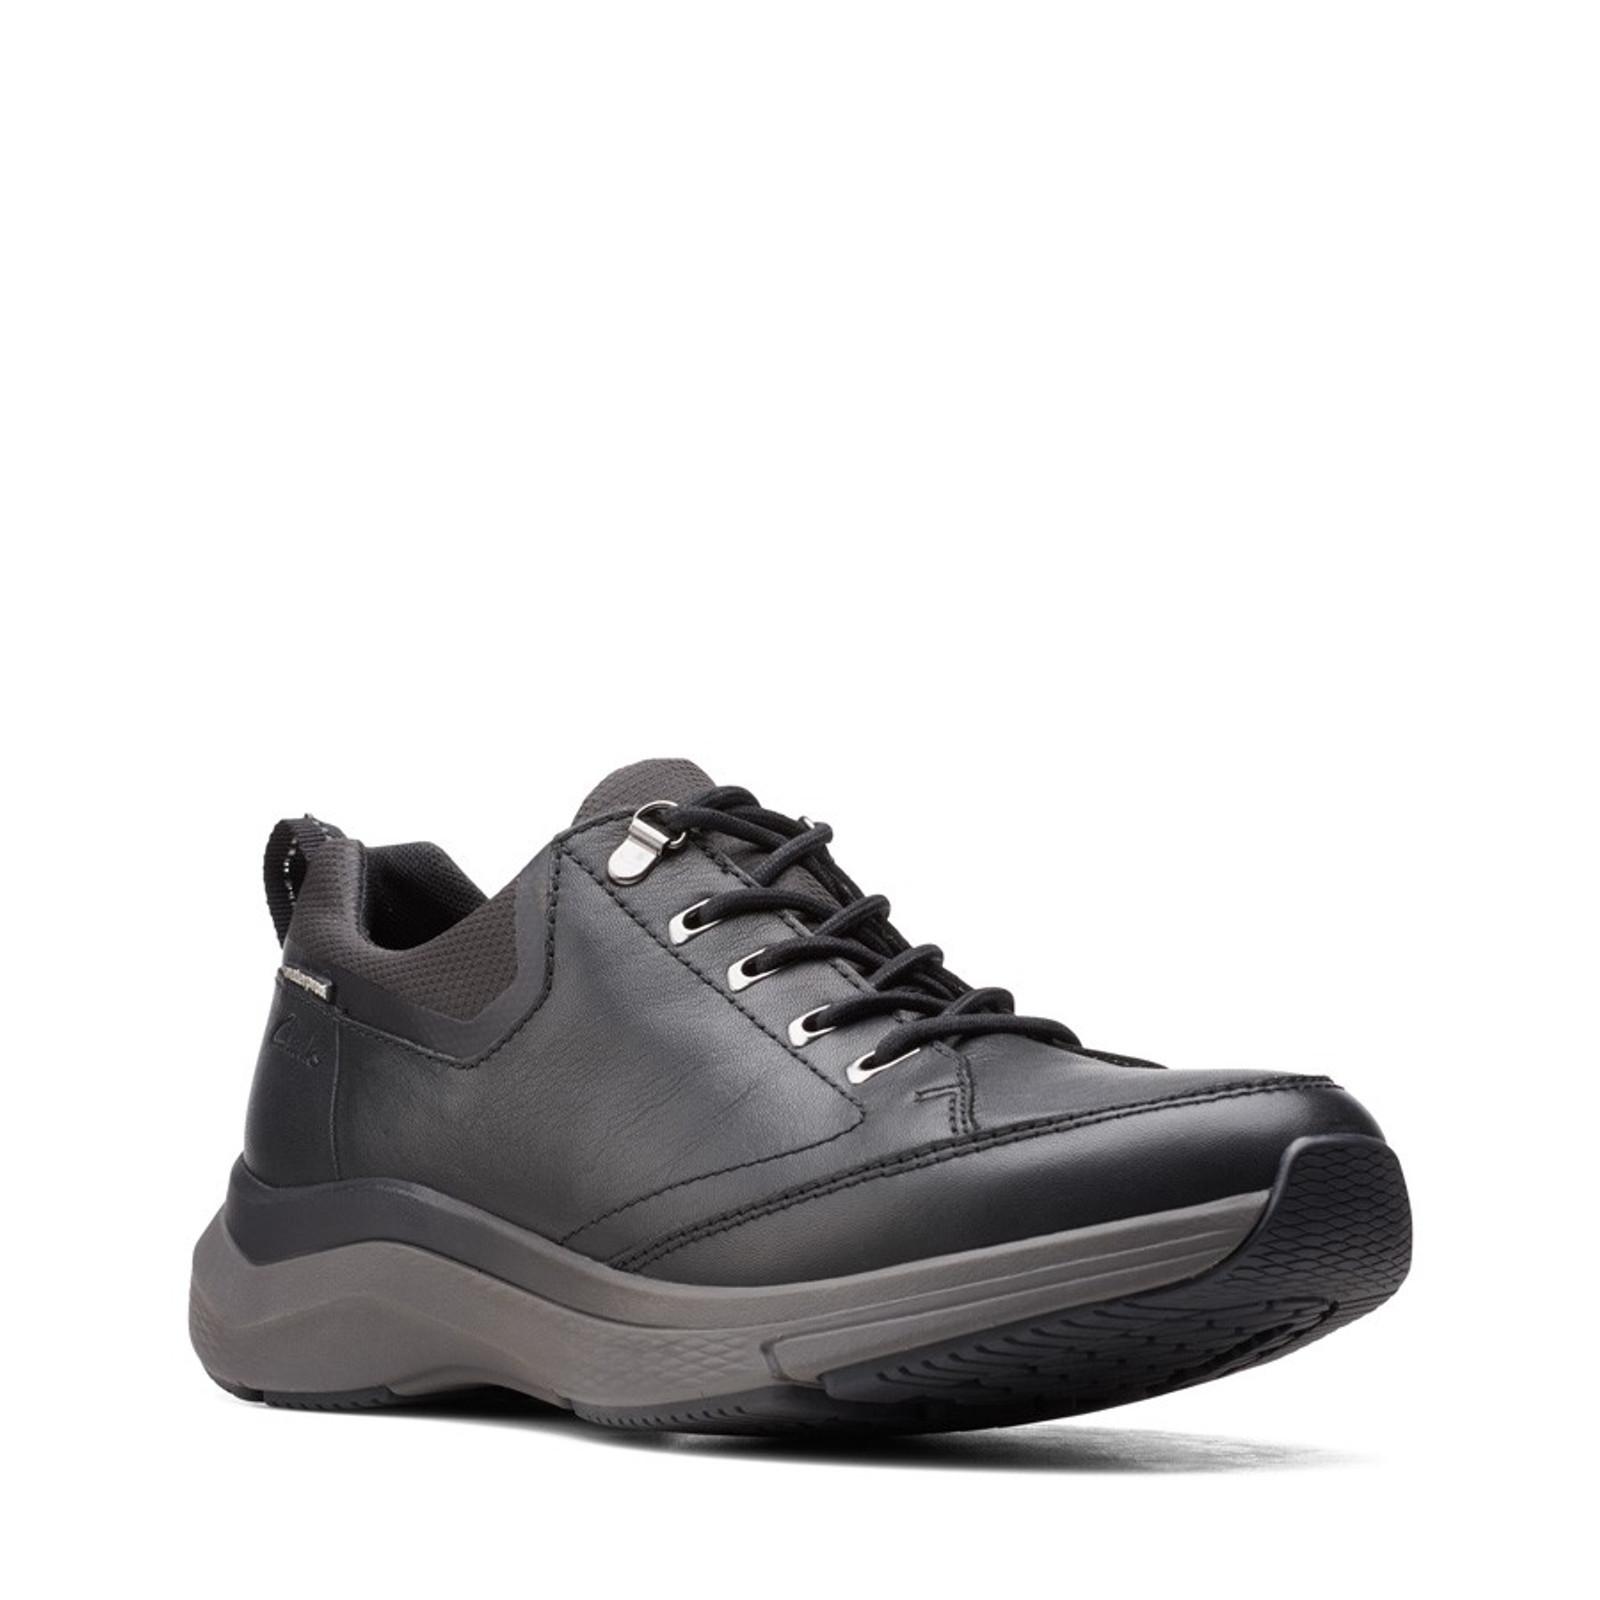 Clarks Mens WAVE2.0 VIBE Black Tumbled Leather